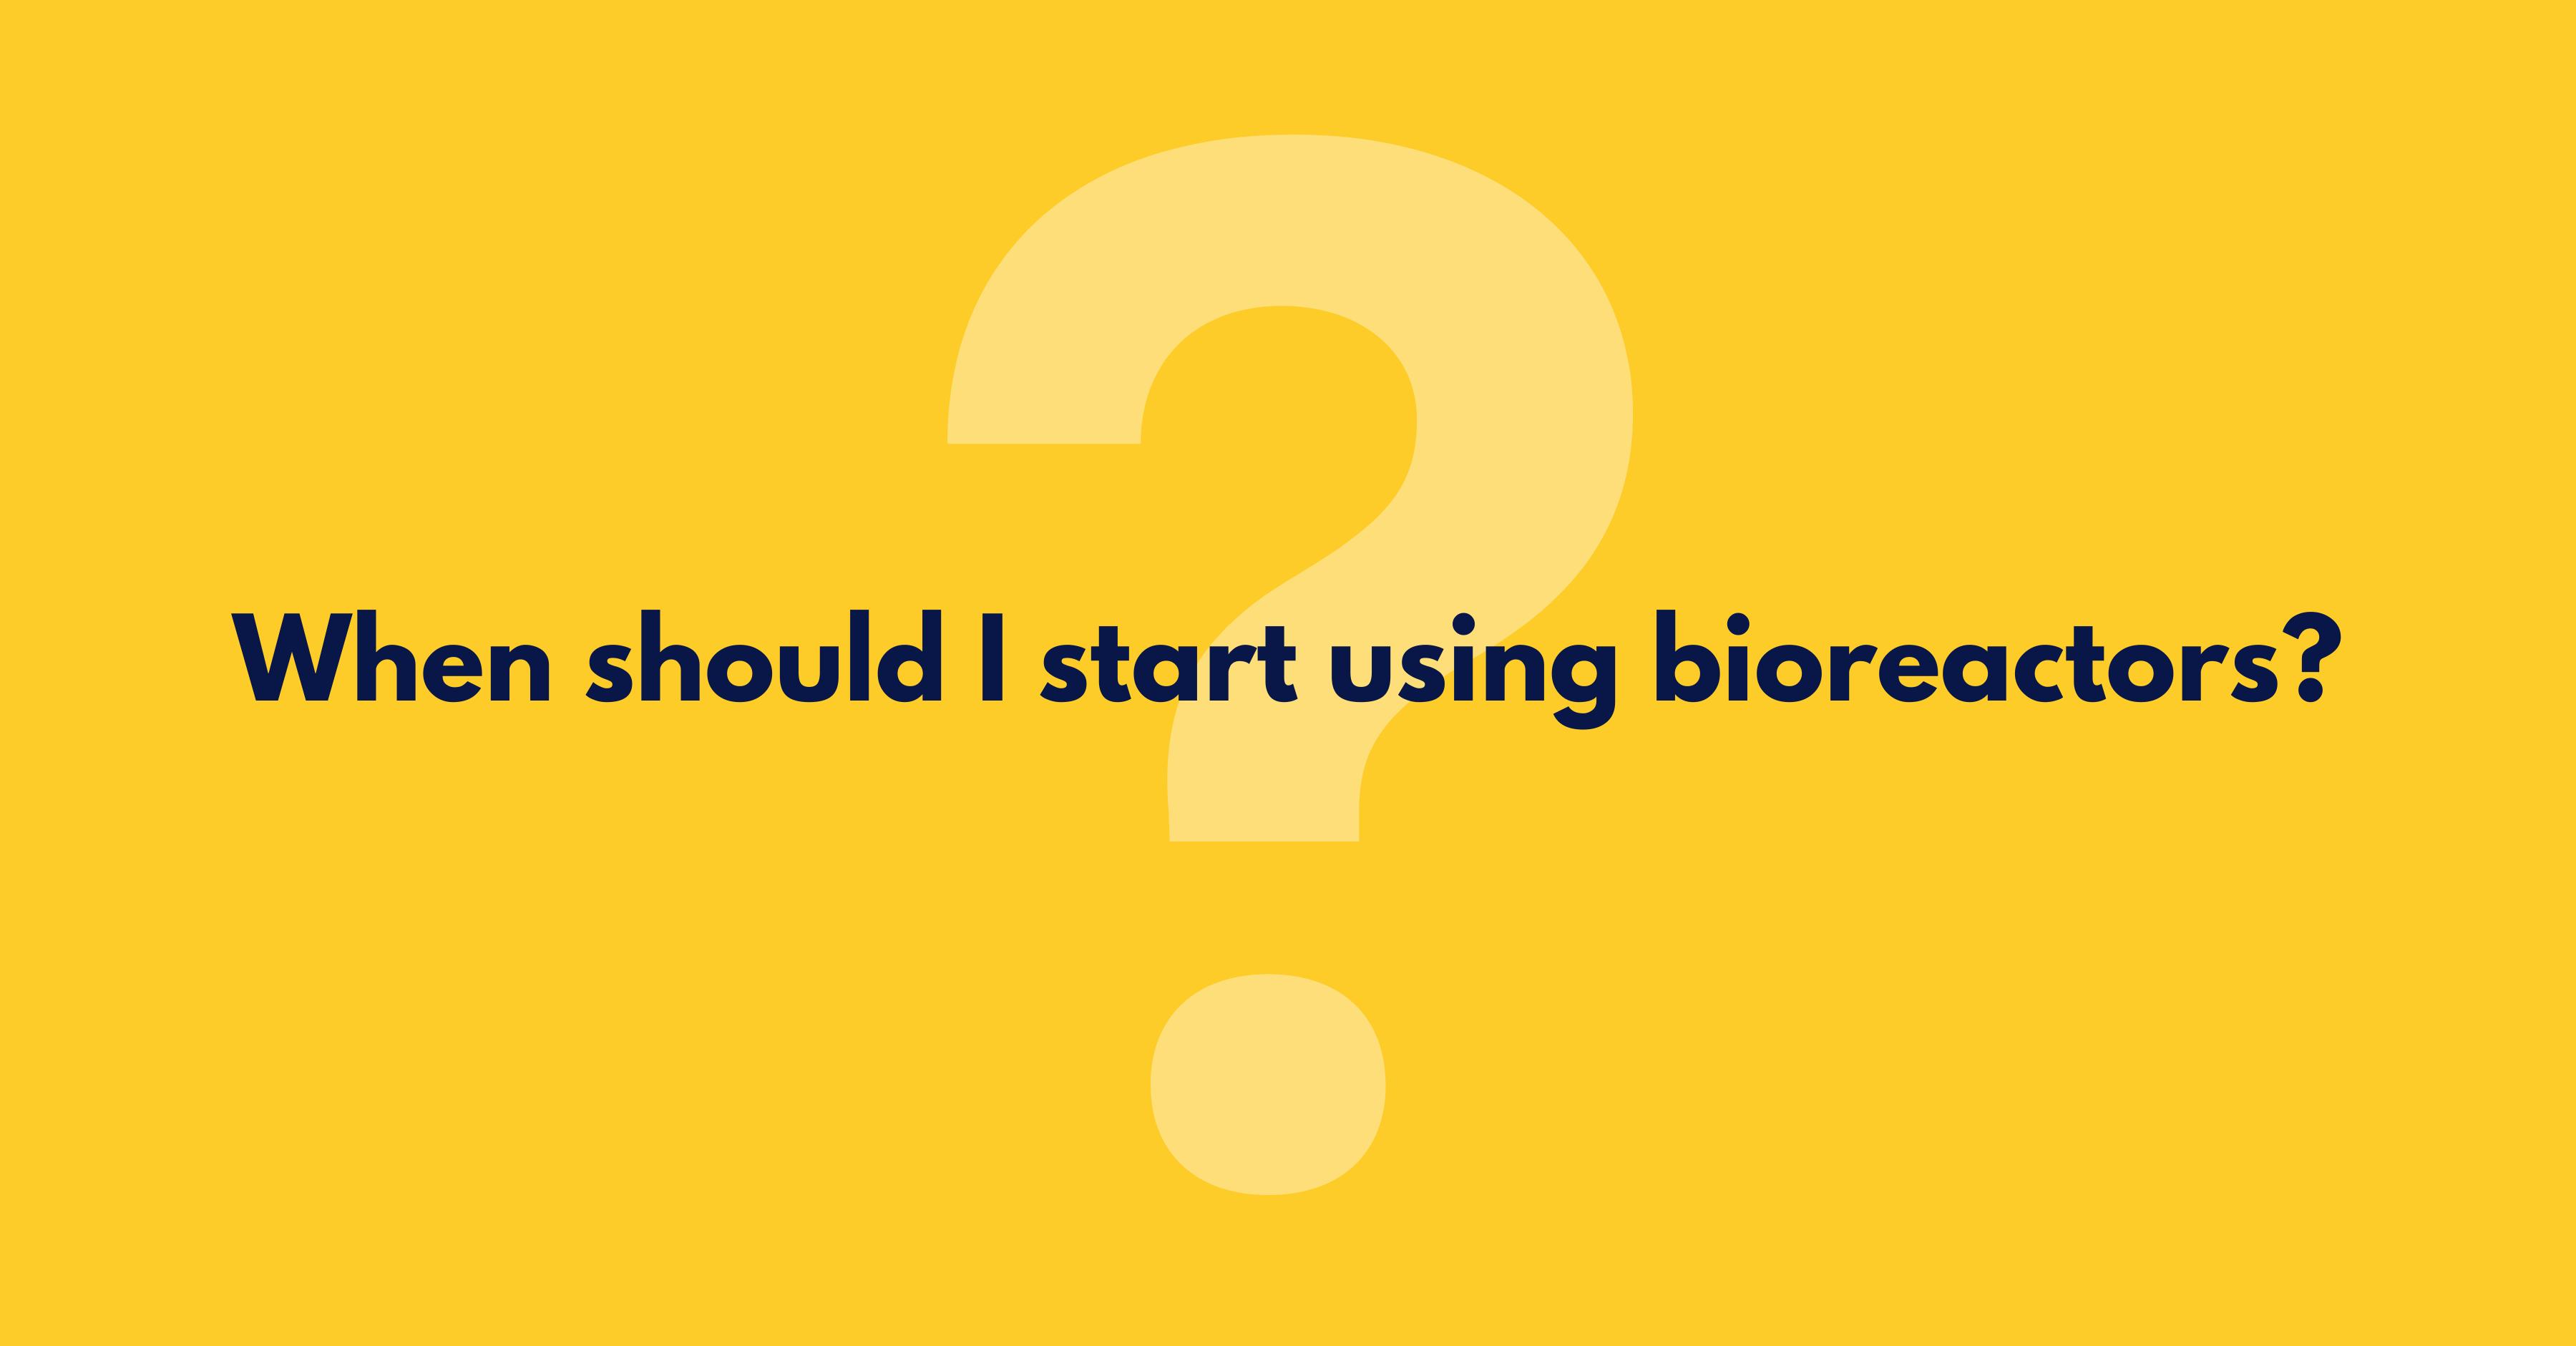 When should I start using bioreactors question graphic